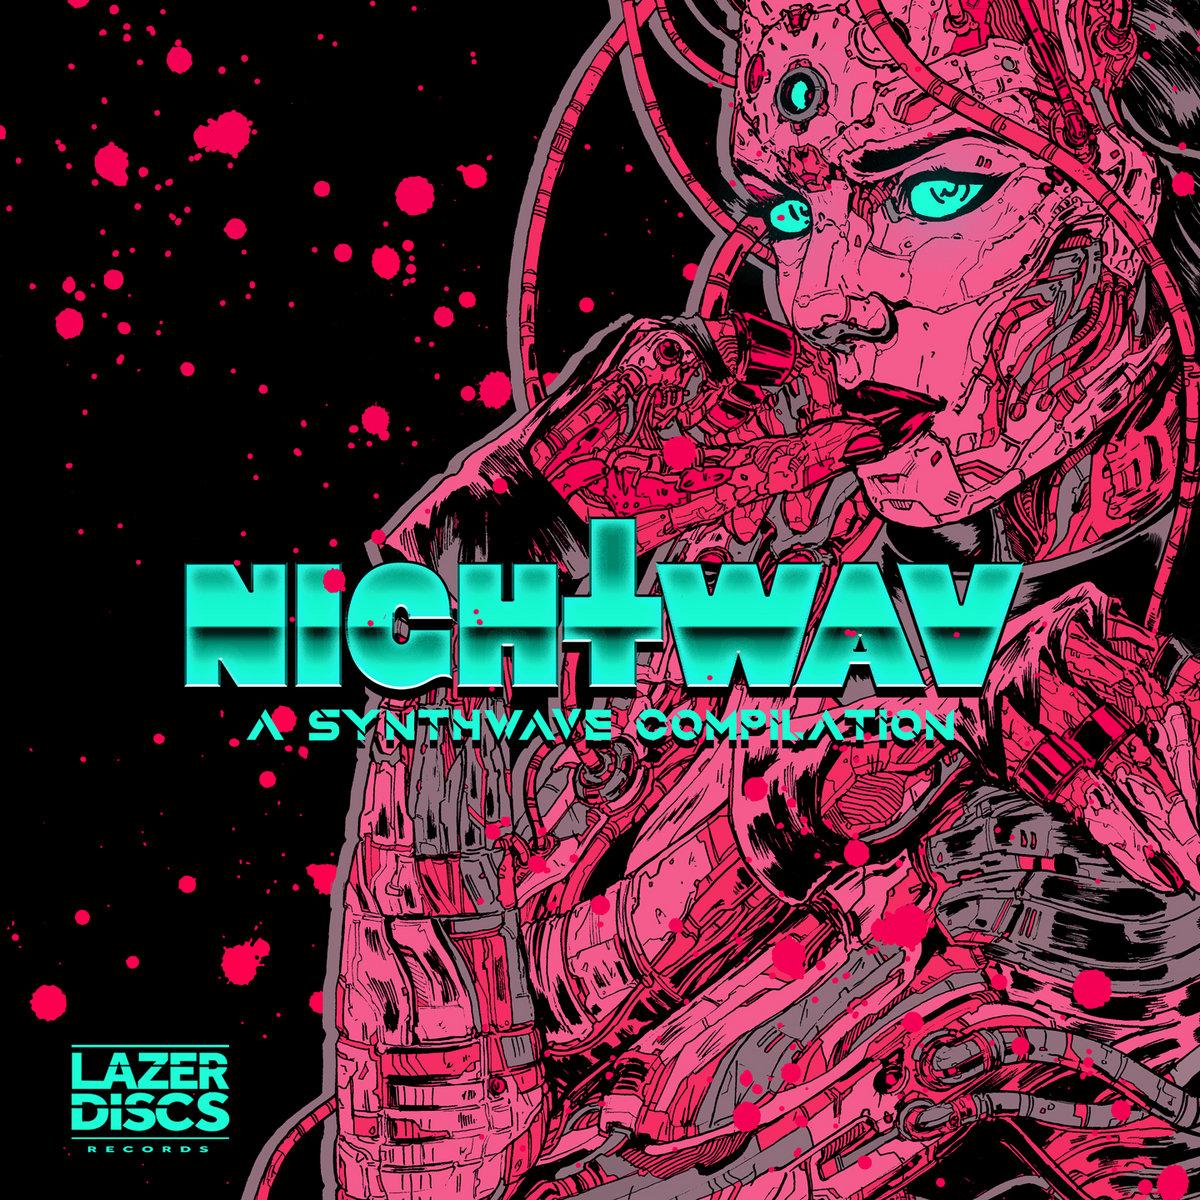 A Synthwave Compilation | Lazerdiscs Records